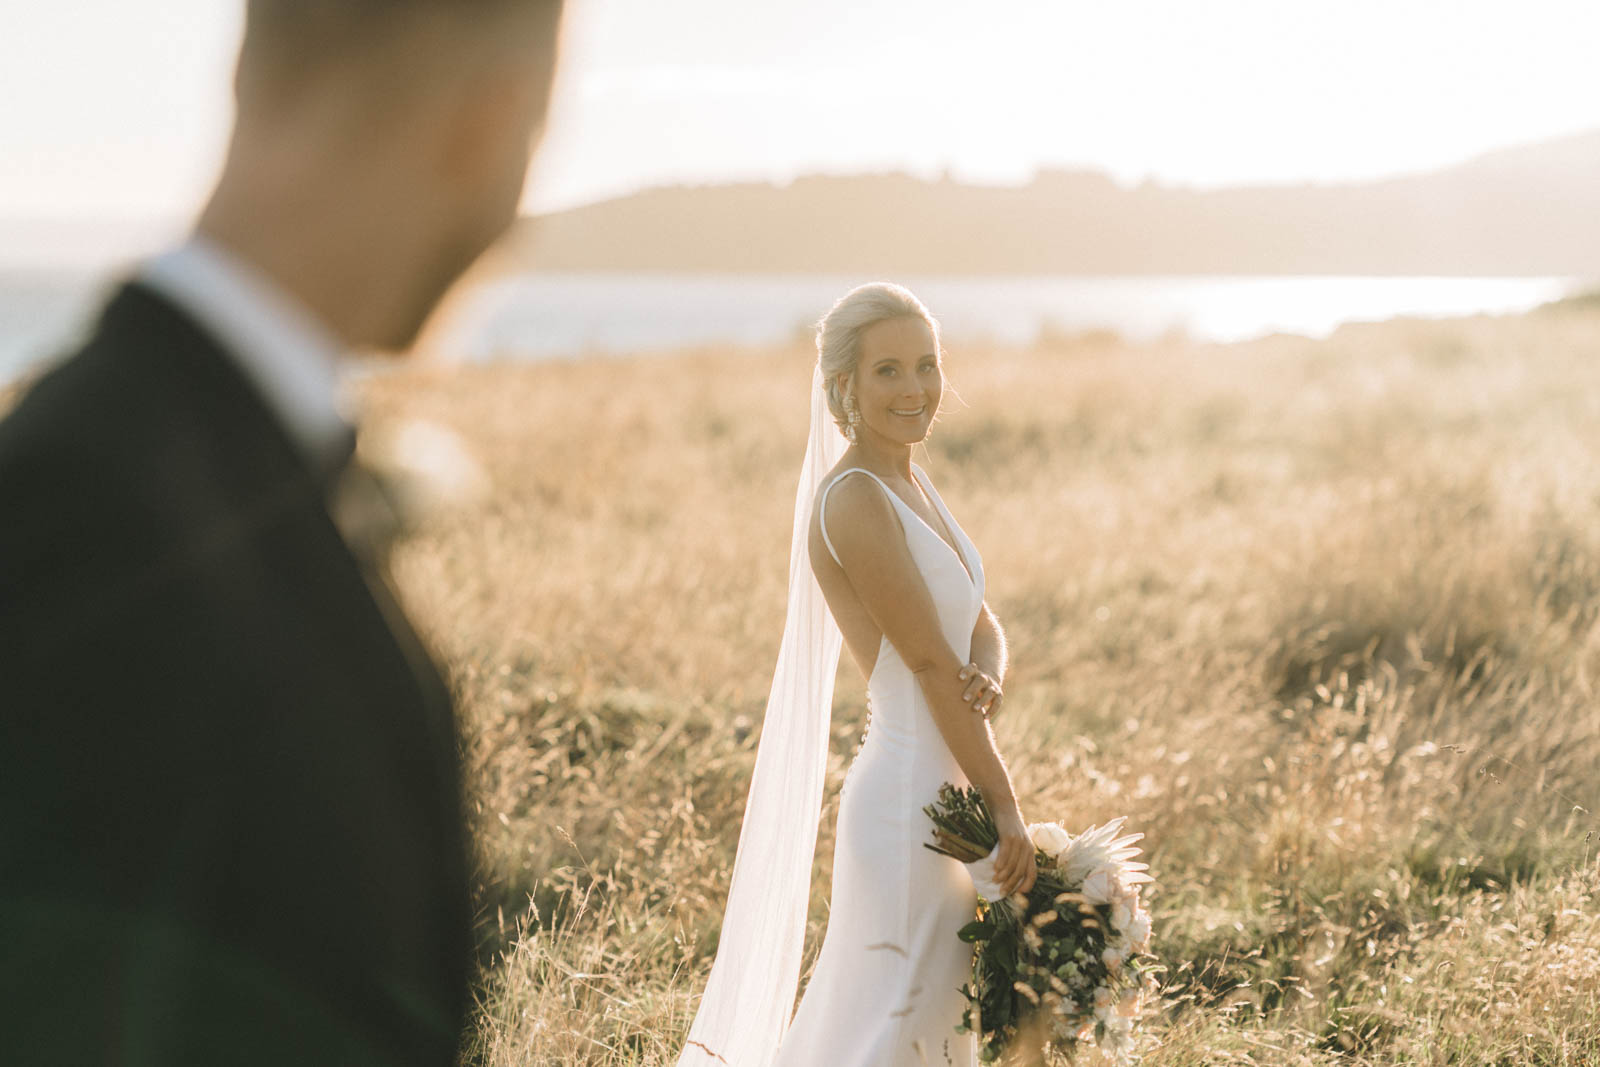 newfound-k-s-hilton-taupo-wedding-photographer-059